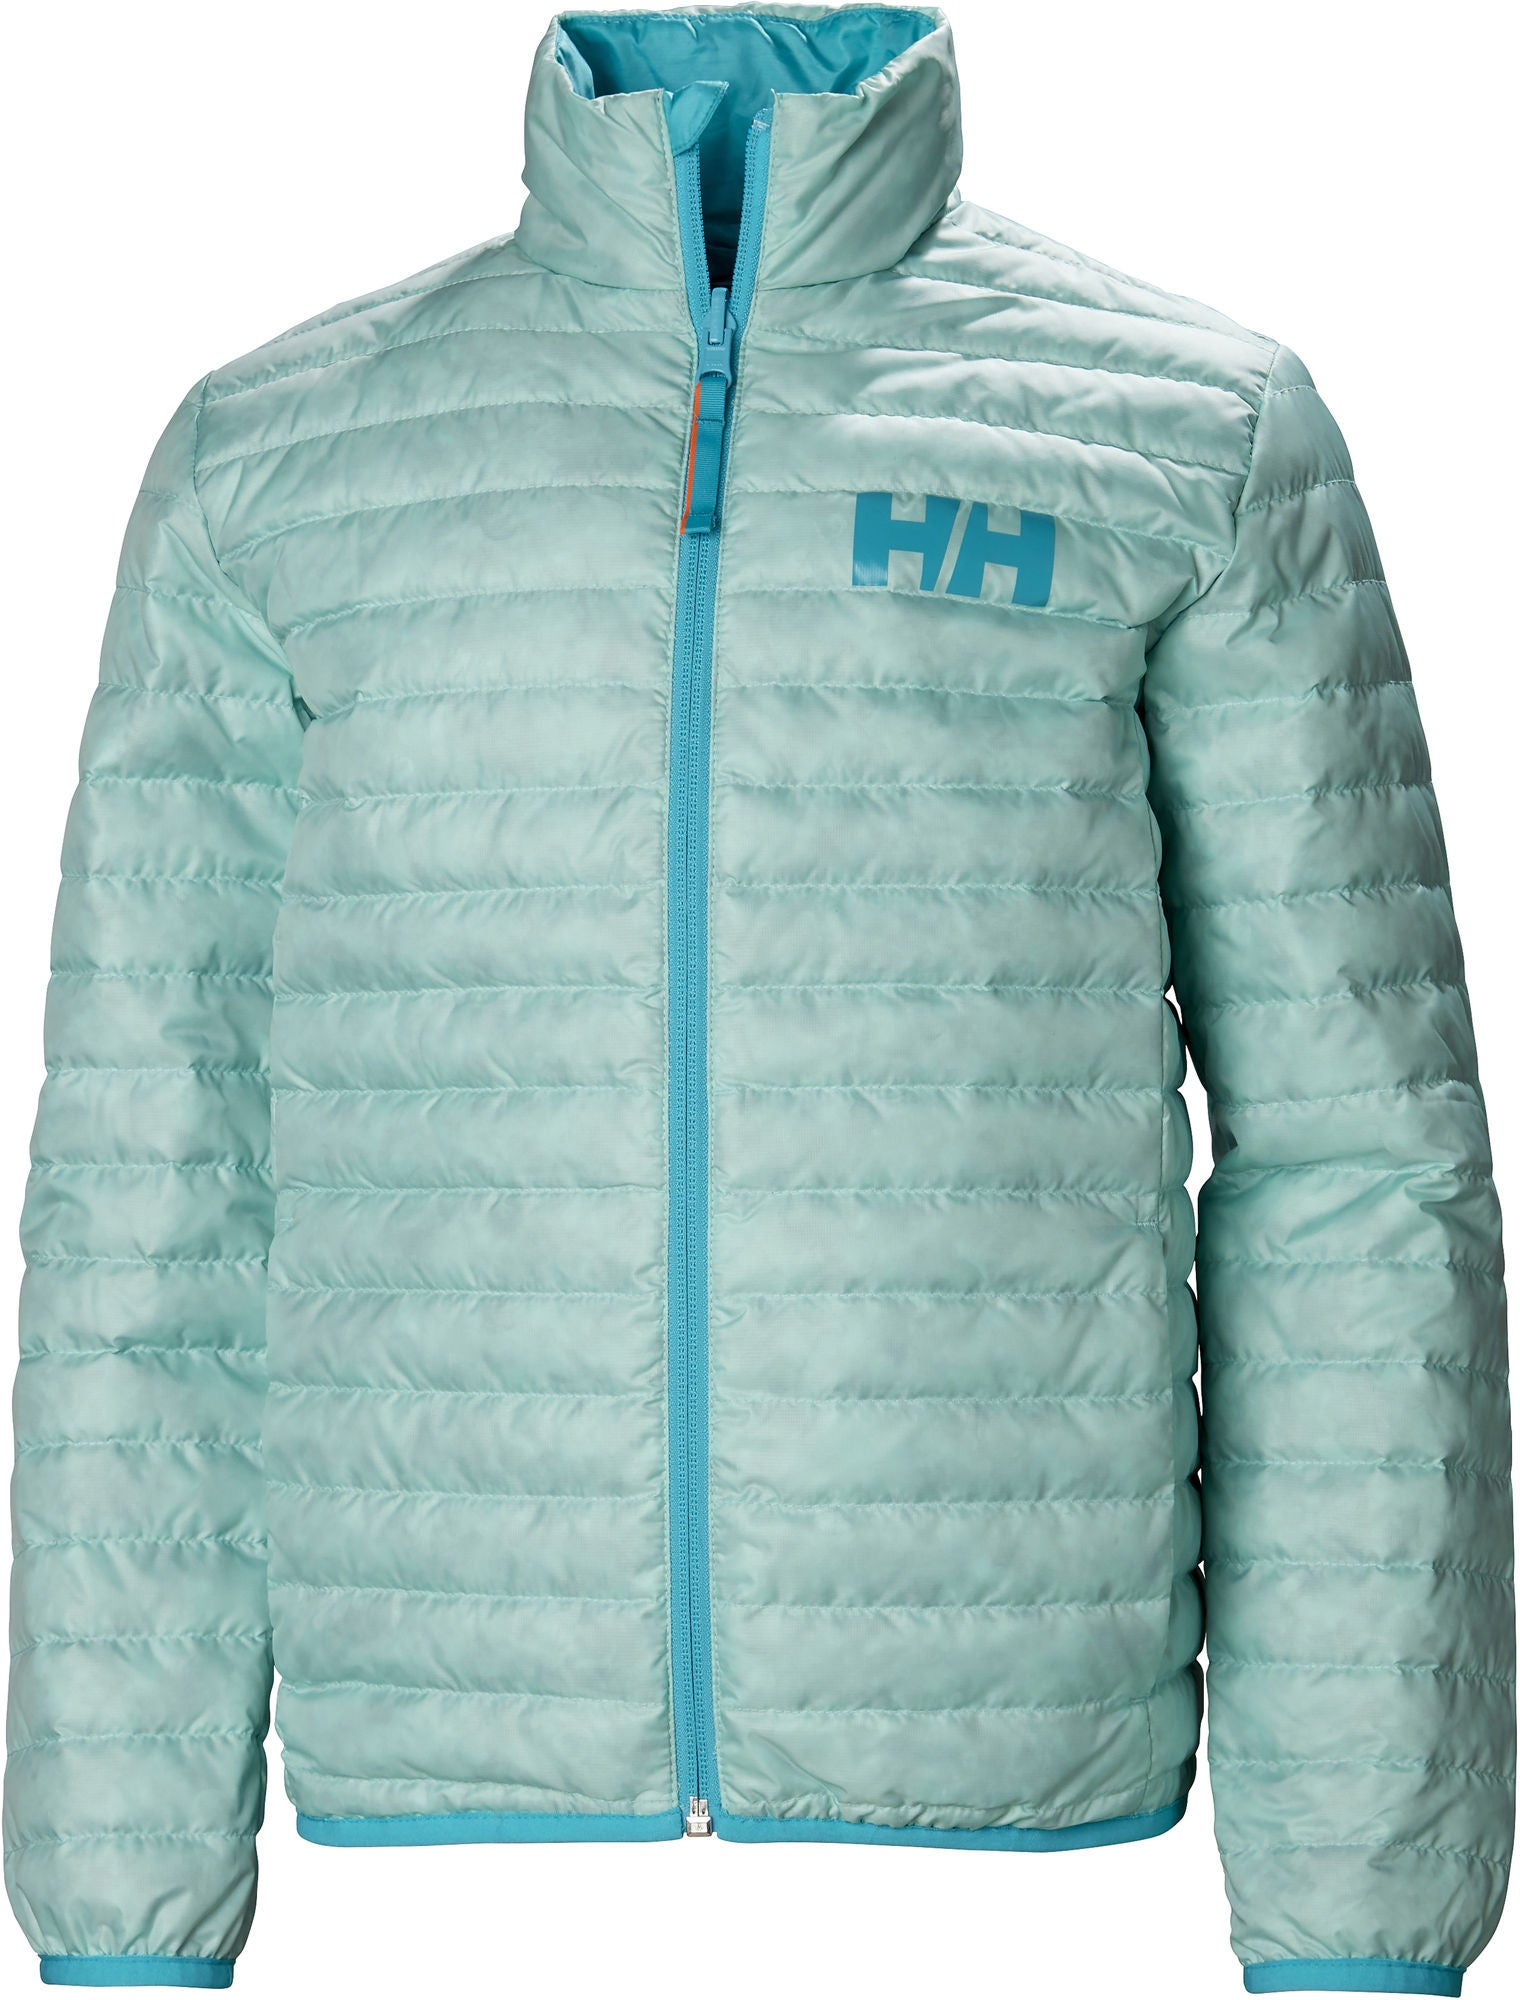 Helly Hansen Down Jacka, Blue Tint 128